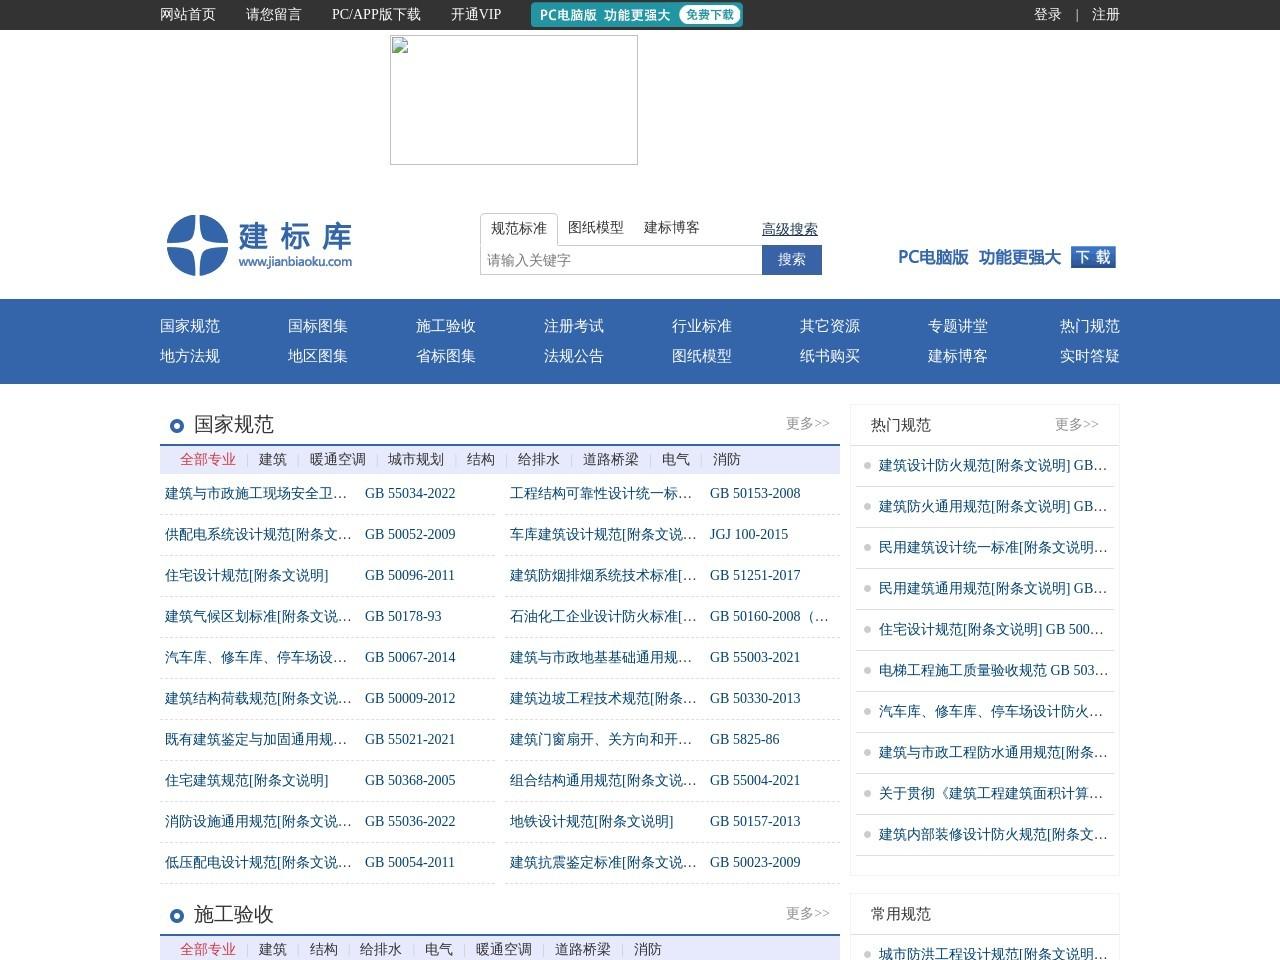 建标库(www.jianbiaoku.com)